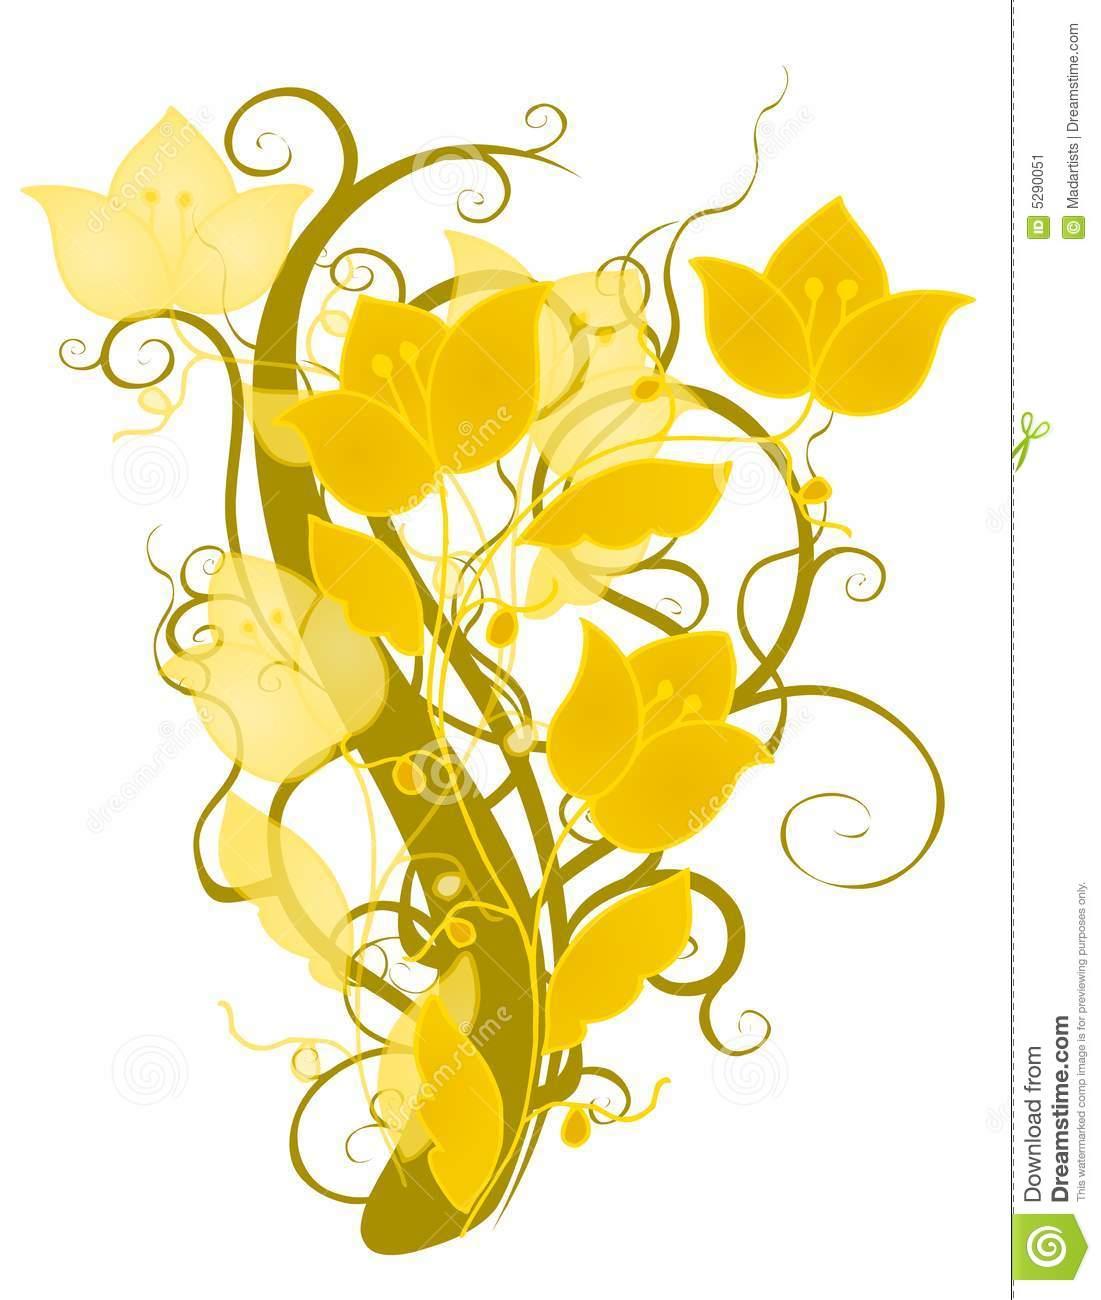 Decorative Gold Flower Design Stock Image.